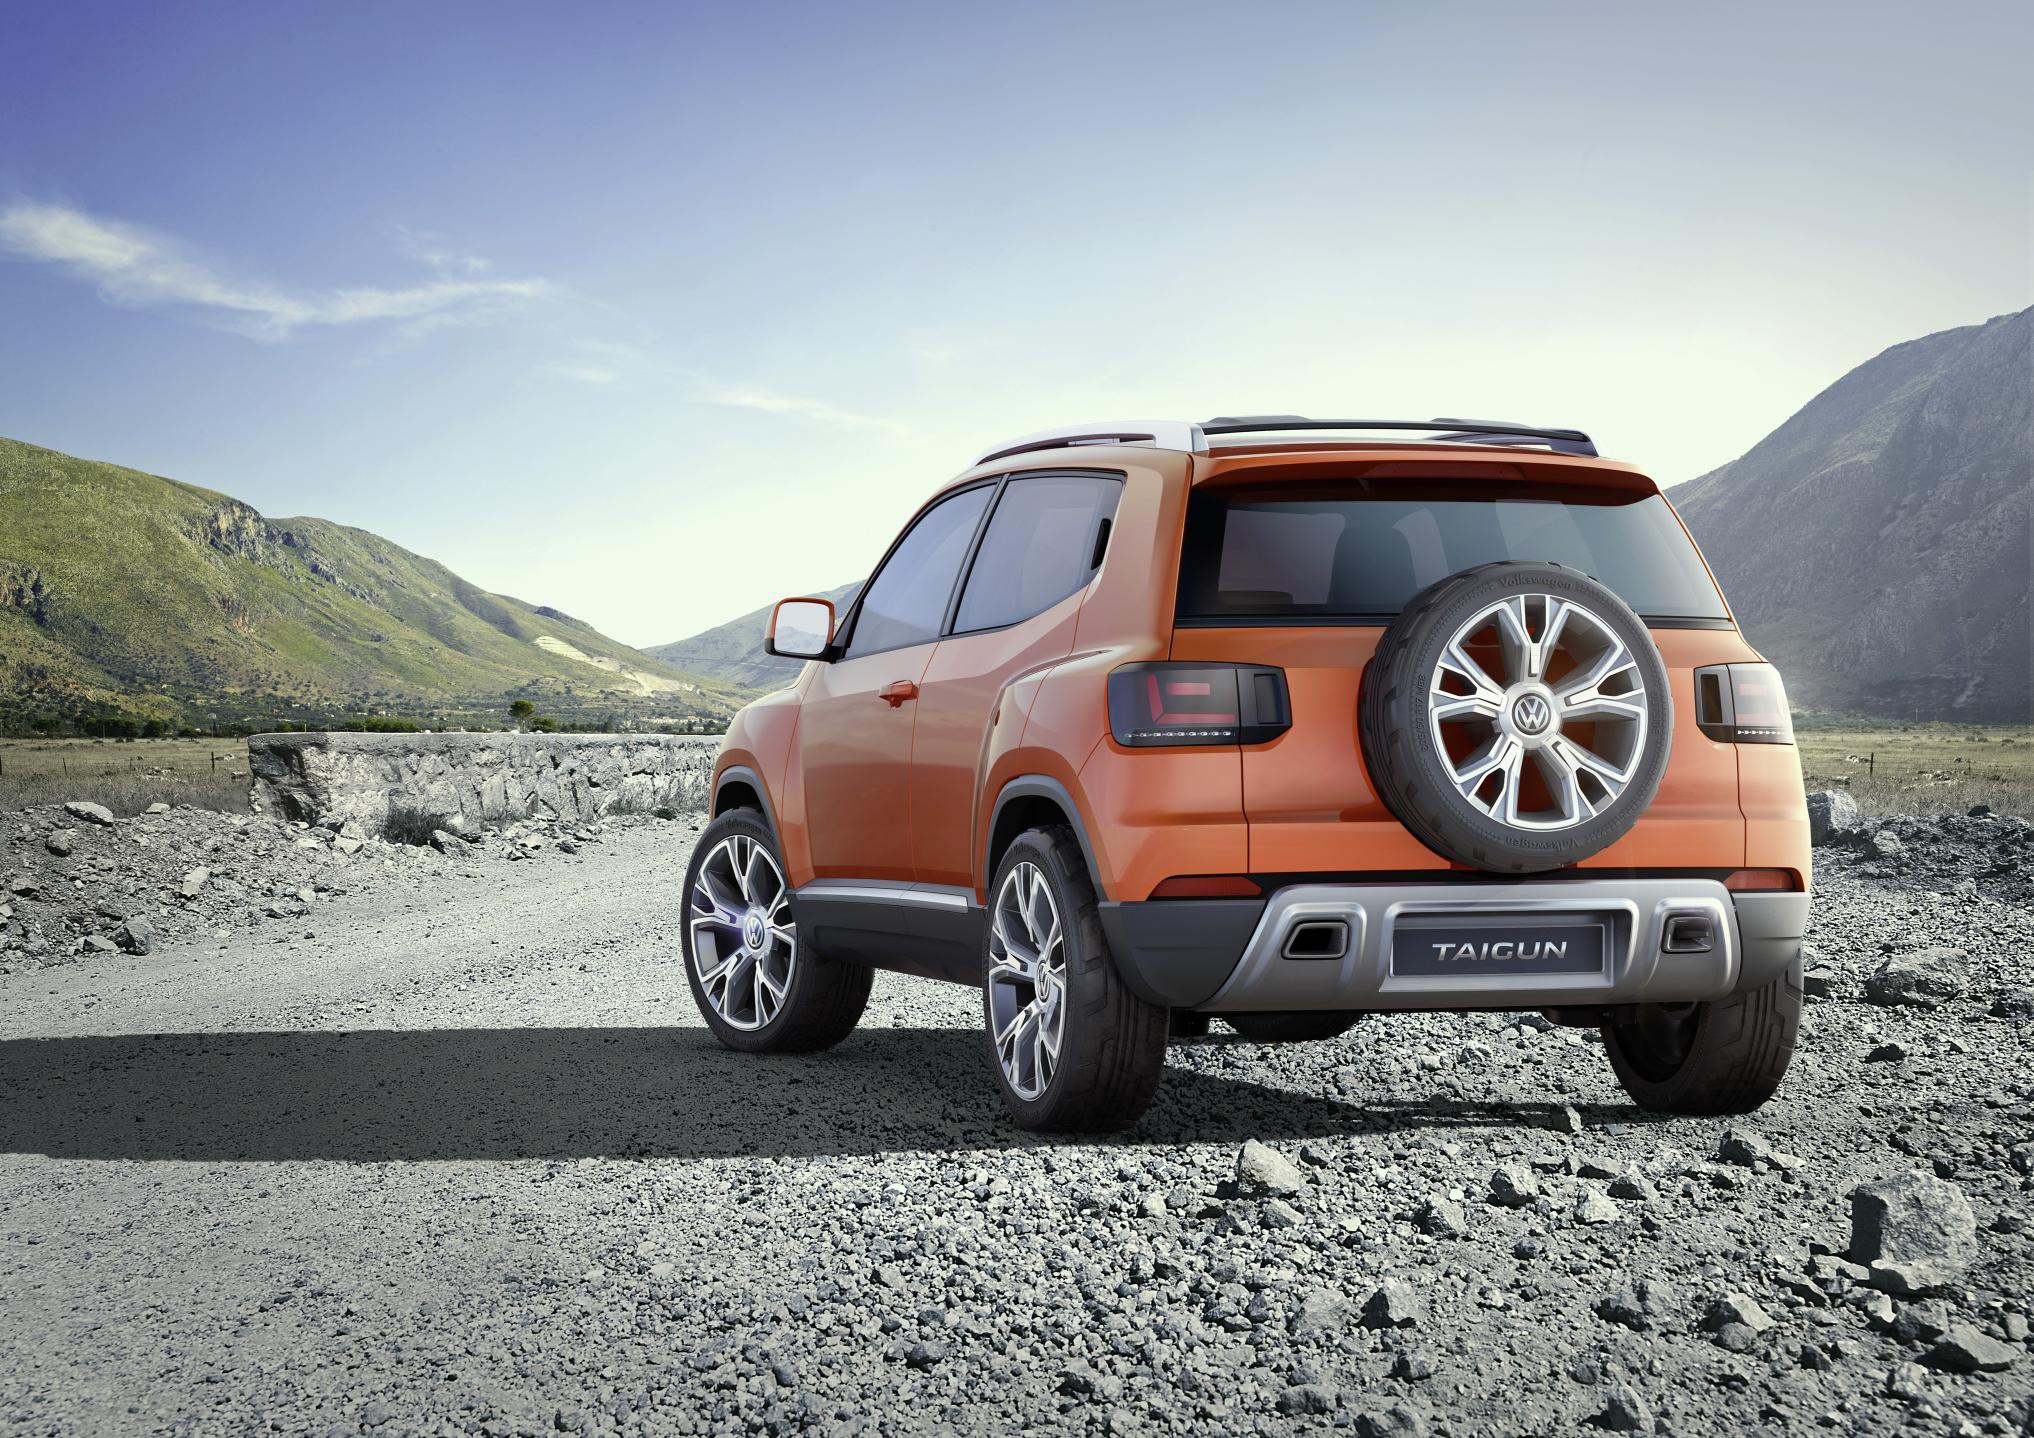 Volkswagen taigun price in bangalore dating